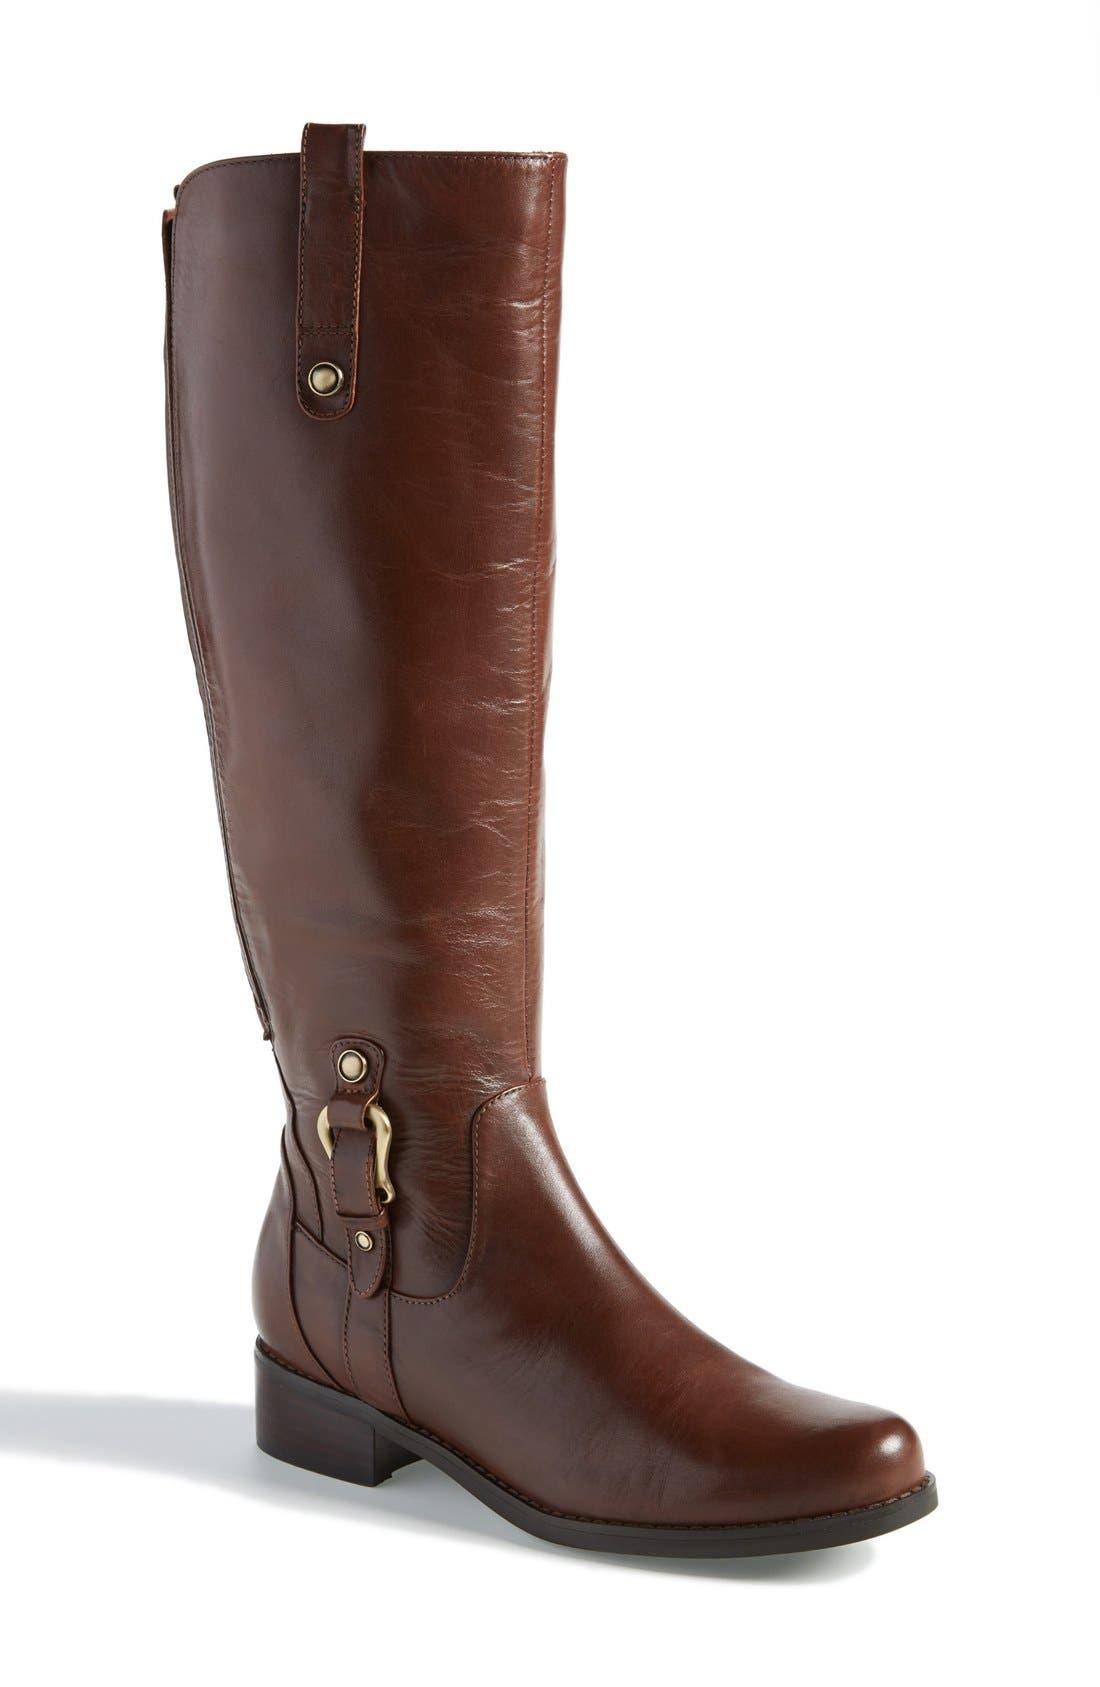 Main Image - Blondo 'Venise' Waterproof Leather Riding Boot (Women)